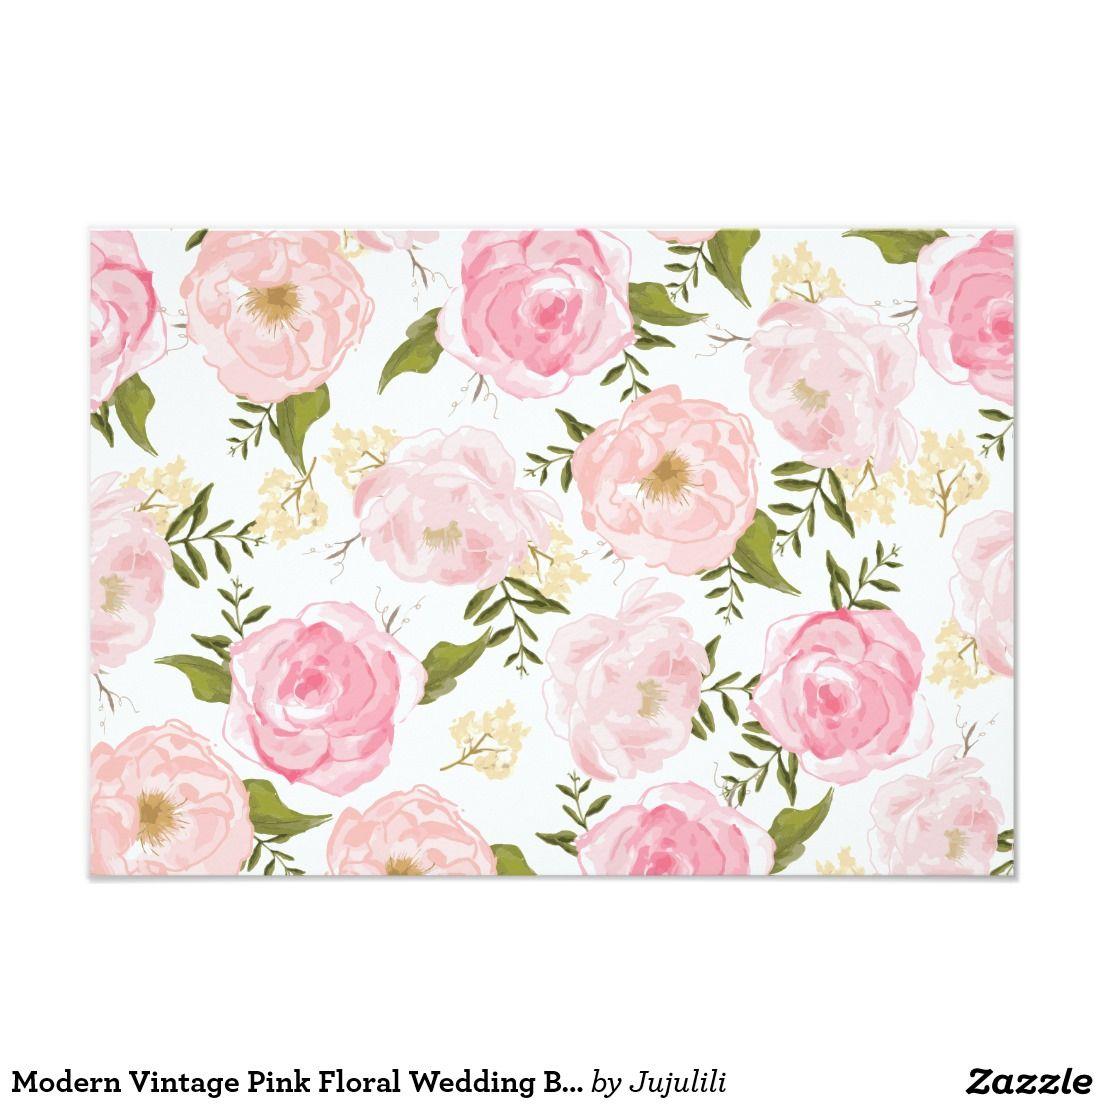 Modern Vintage Pink Floral Wedding Blank Card   Floral wedding ...